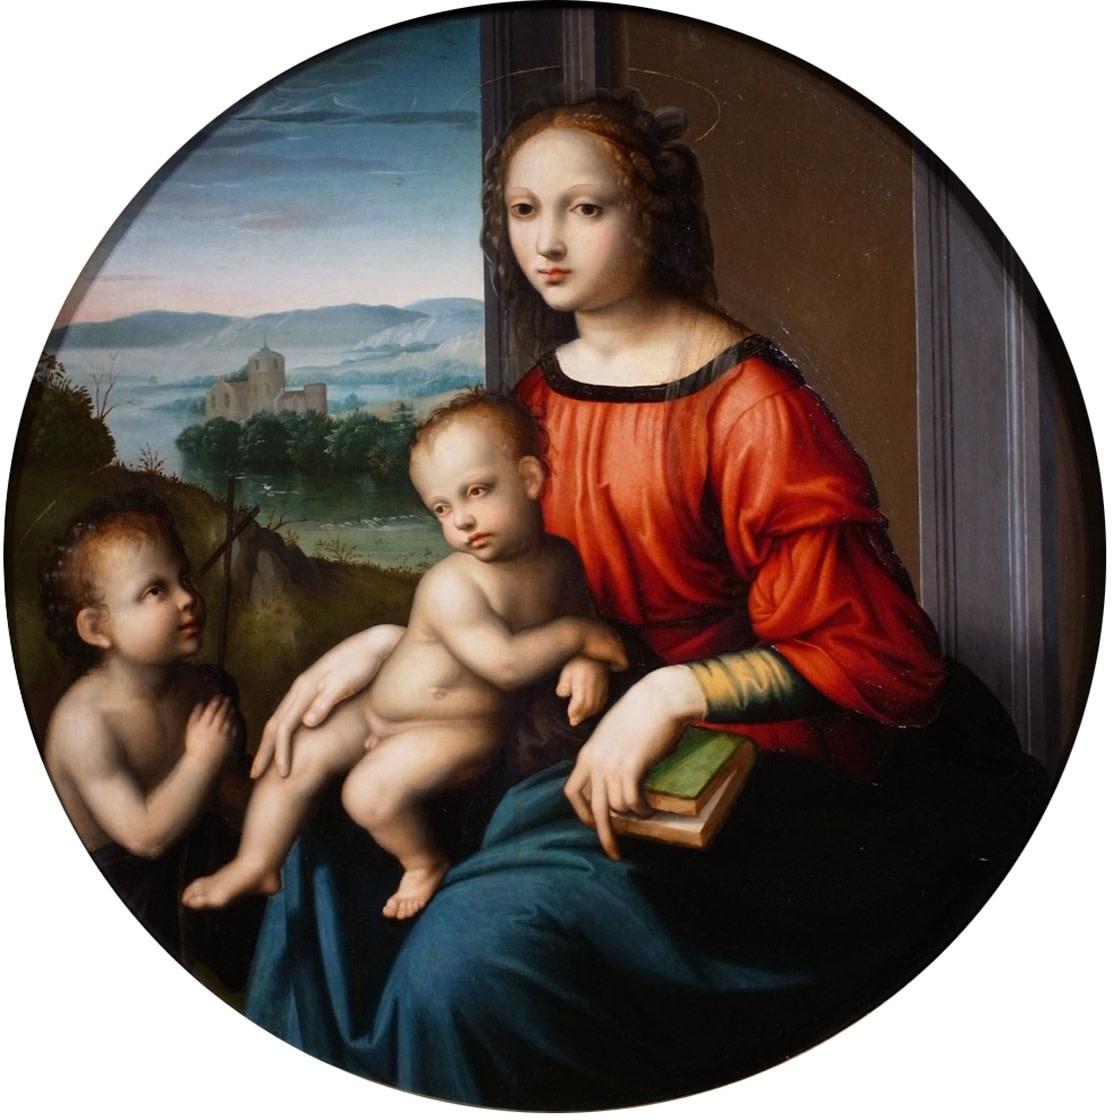 <span class=&#34;link fancybox-details-link&#34;><a href=&#34;/artworks/131/&#34;>View Detail Page</a></span><div class=&#34;artist&#34;><strong>Master of the Scandicci Lamentation</strong></div> <div class=&#34;title&#34;><em>Madonna and Child with the Infant Saint john the Baptist</em></div> <div class=&#34;medium&#34;>Oil on panel</div> <div class=&#34;dimensions&#34;>diameter: 83.9 cm</div>